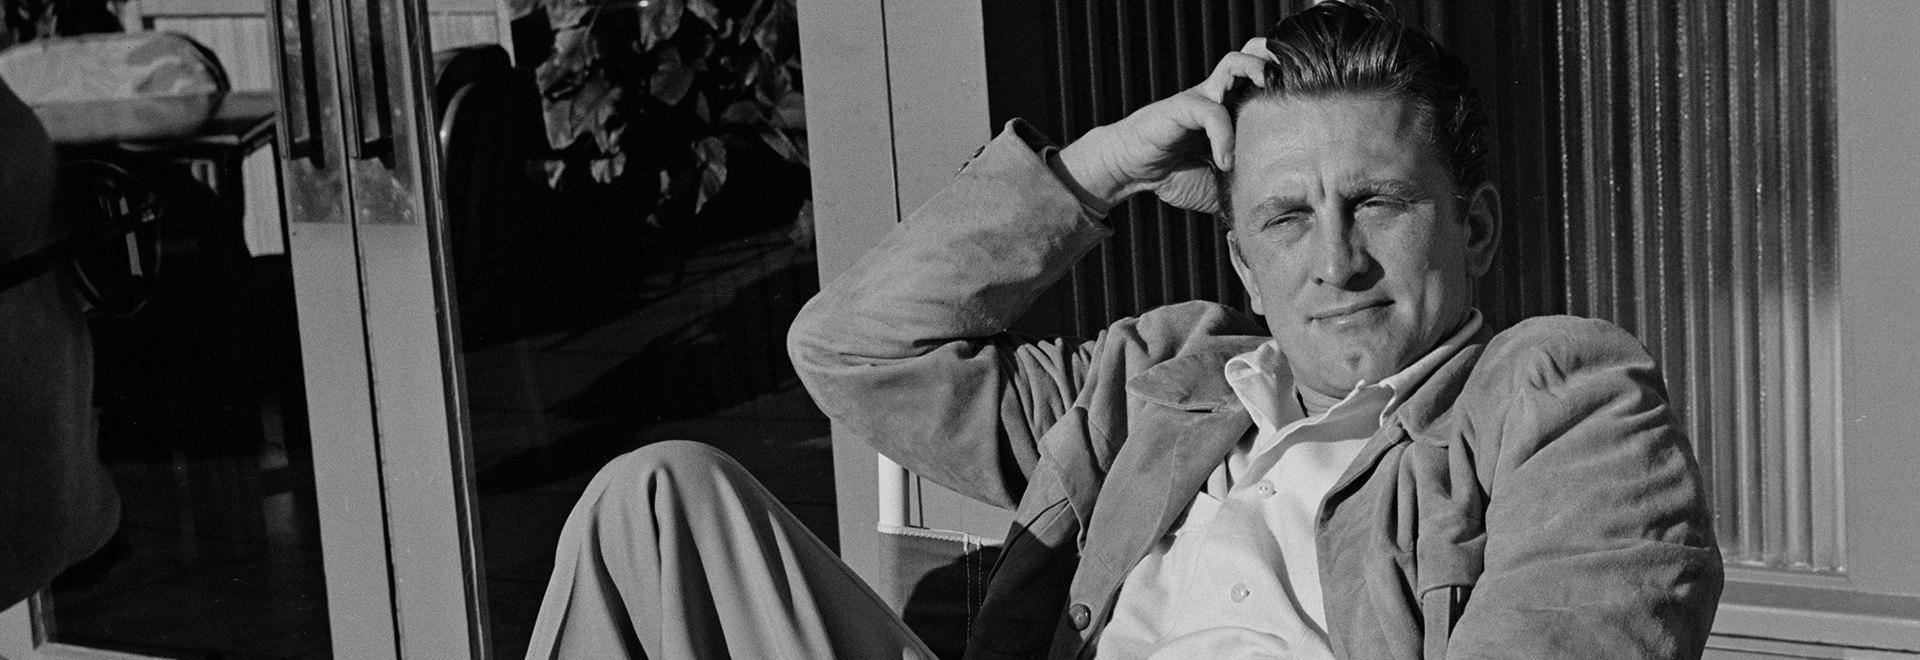 Kirk Douglas - L'indomabile